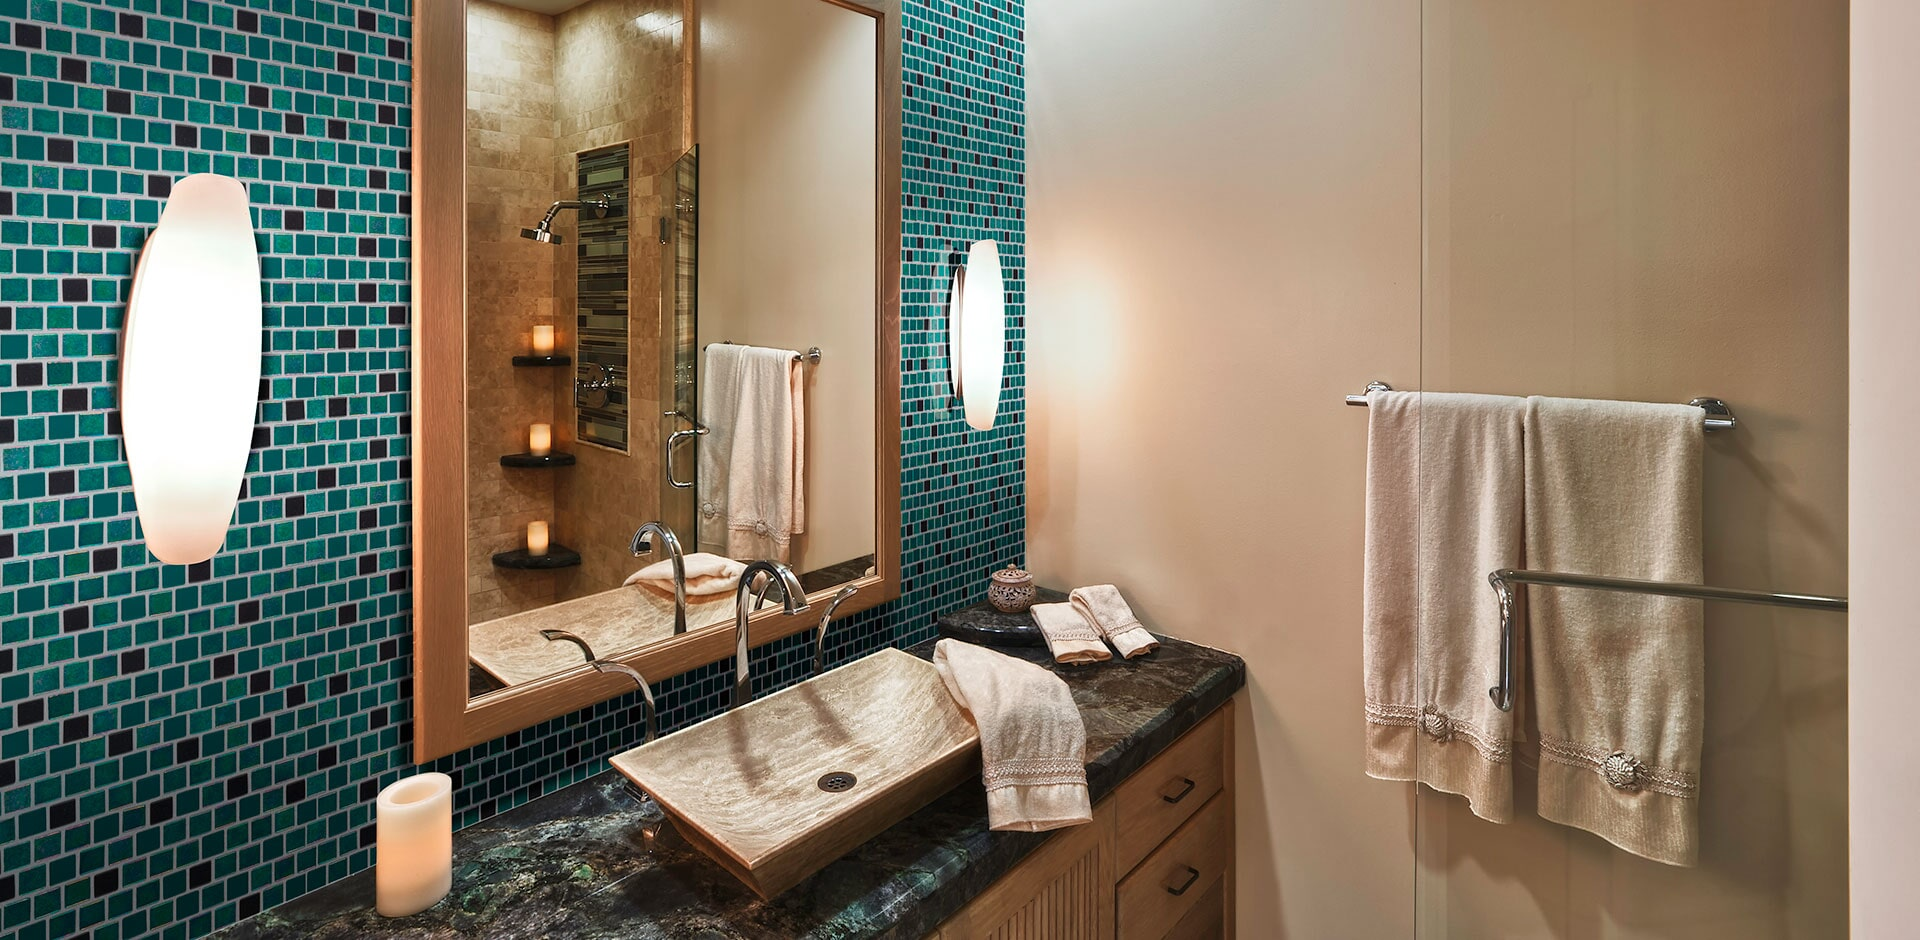 carribean mermaid bathroom design